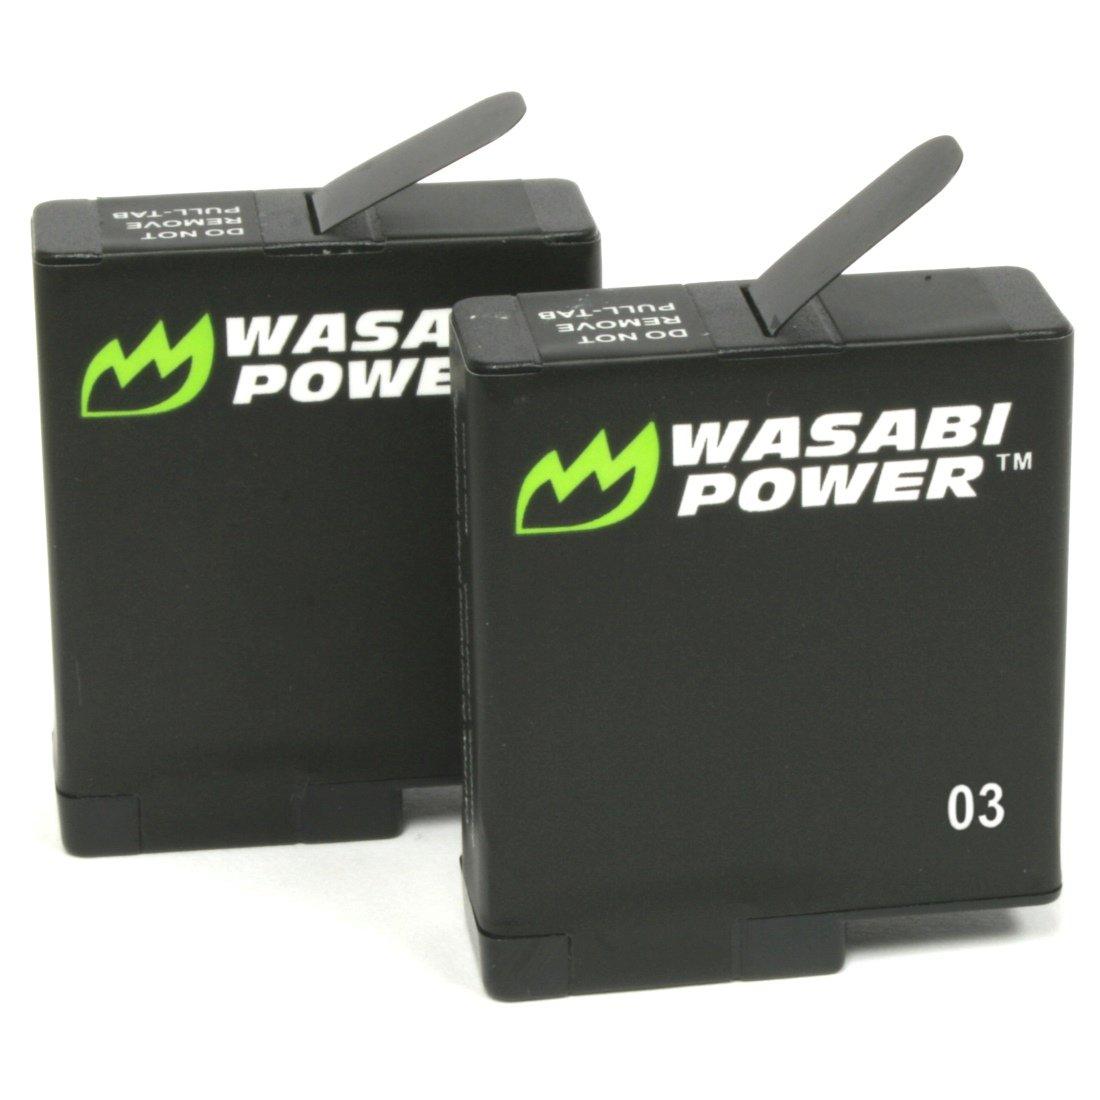 Wasabi Power Battery (2-Pack) for GoPro HERO7 Black, HERO6 Black, HERO5 Black, Hero (2018 Model)